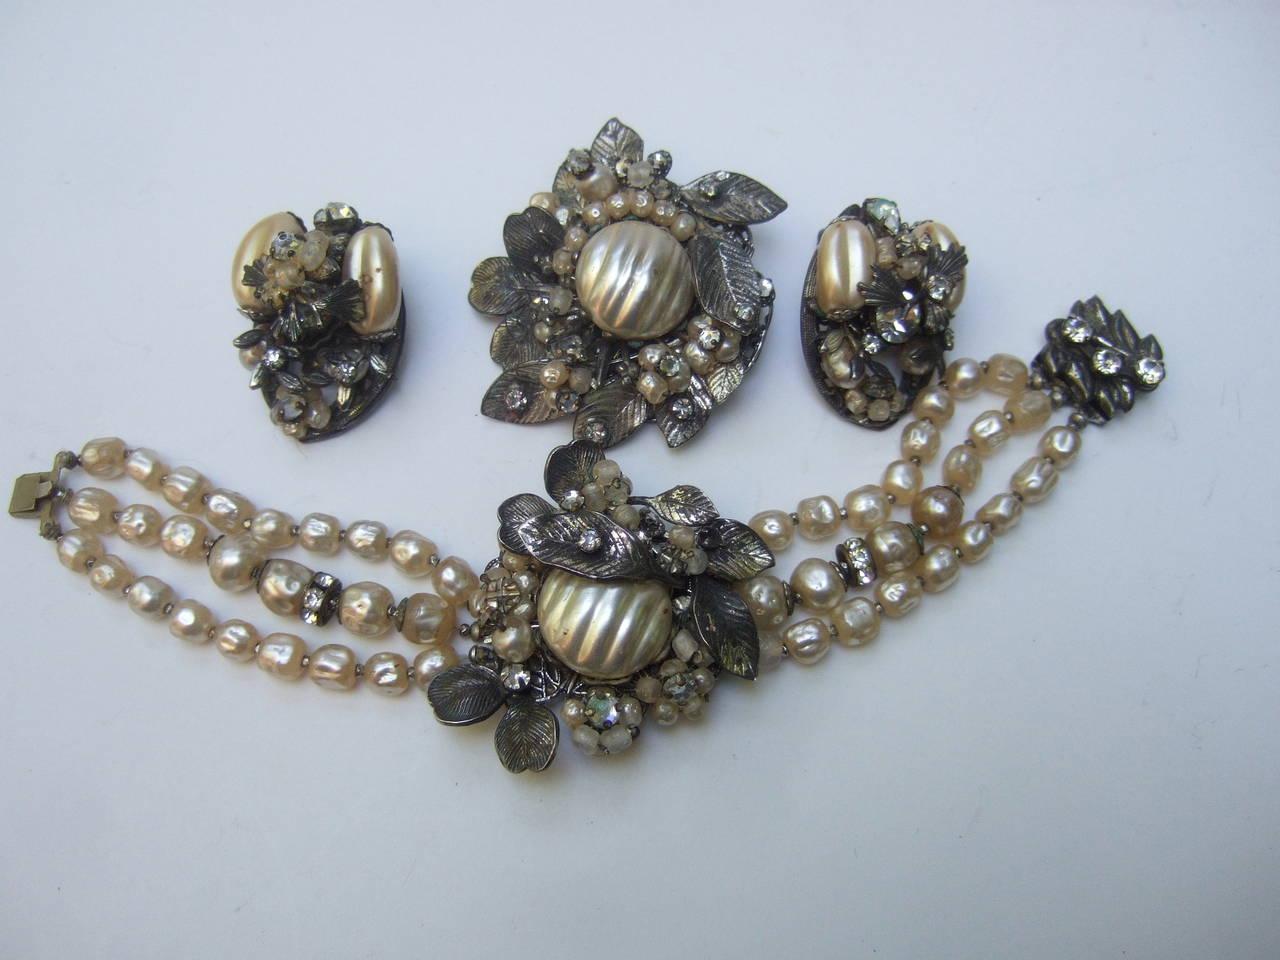 1950s Costume Pearl Brooch, Bracelet & Earrings by Robert For Sale 3